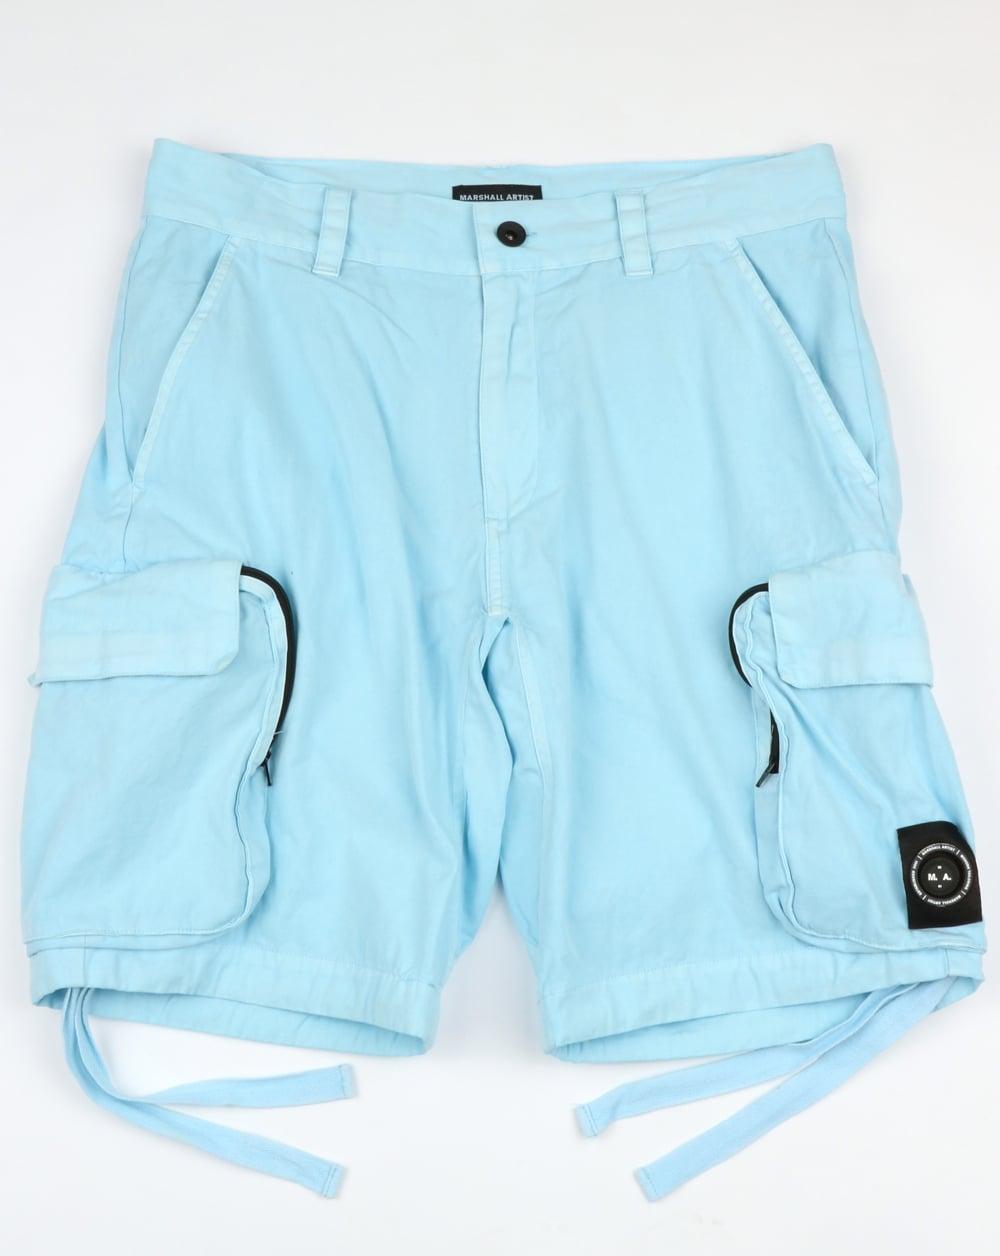 Marshall Artist SS18 garment dyed shorts